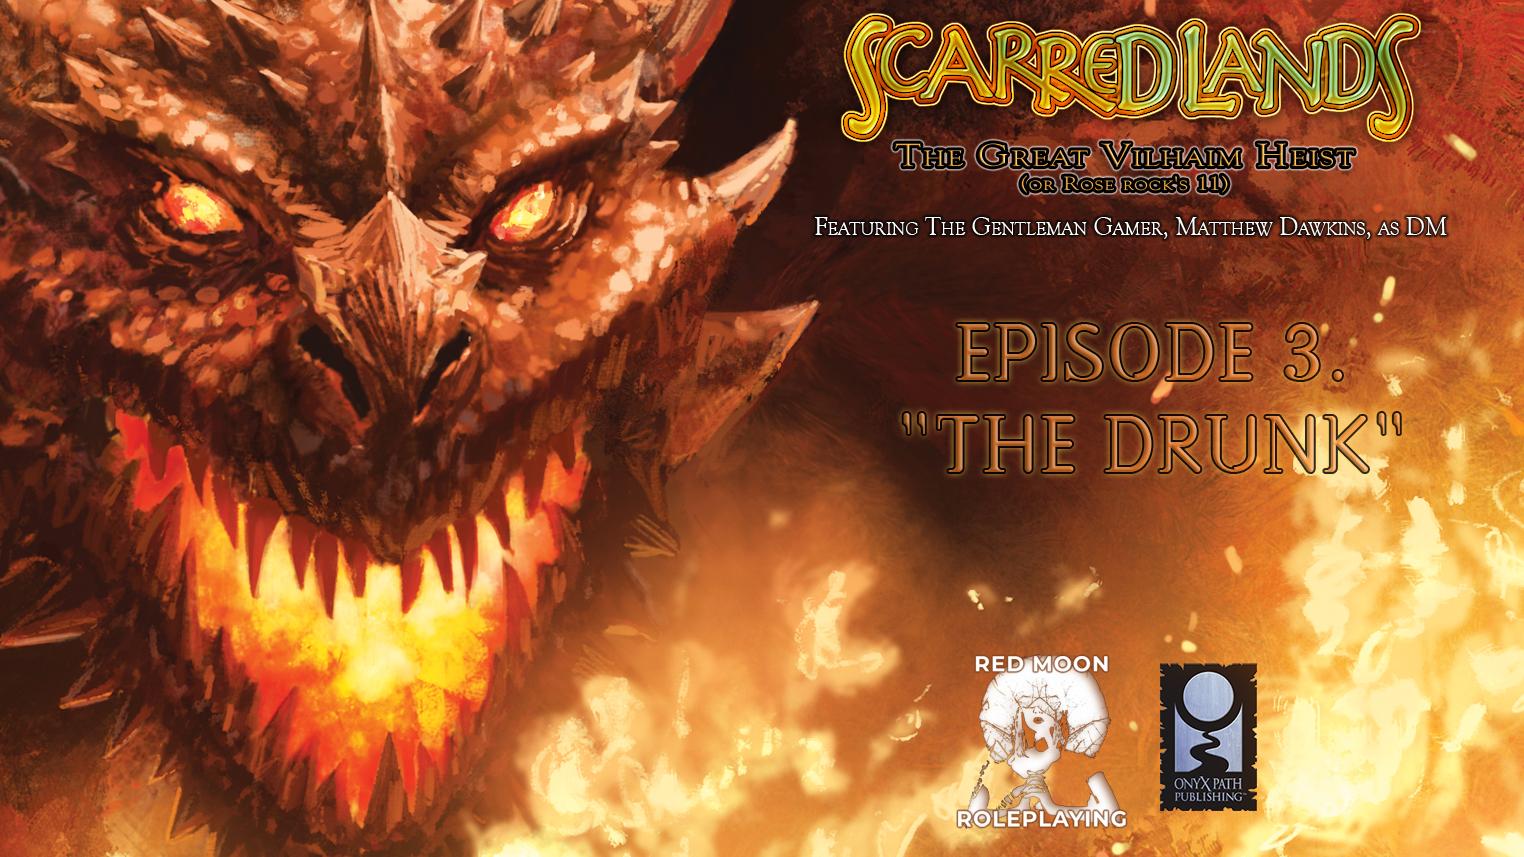 SCARRED_03.jpg